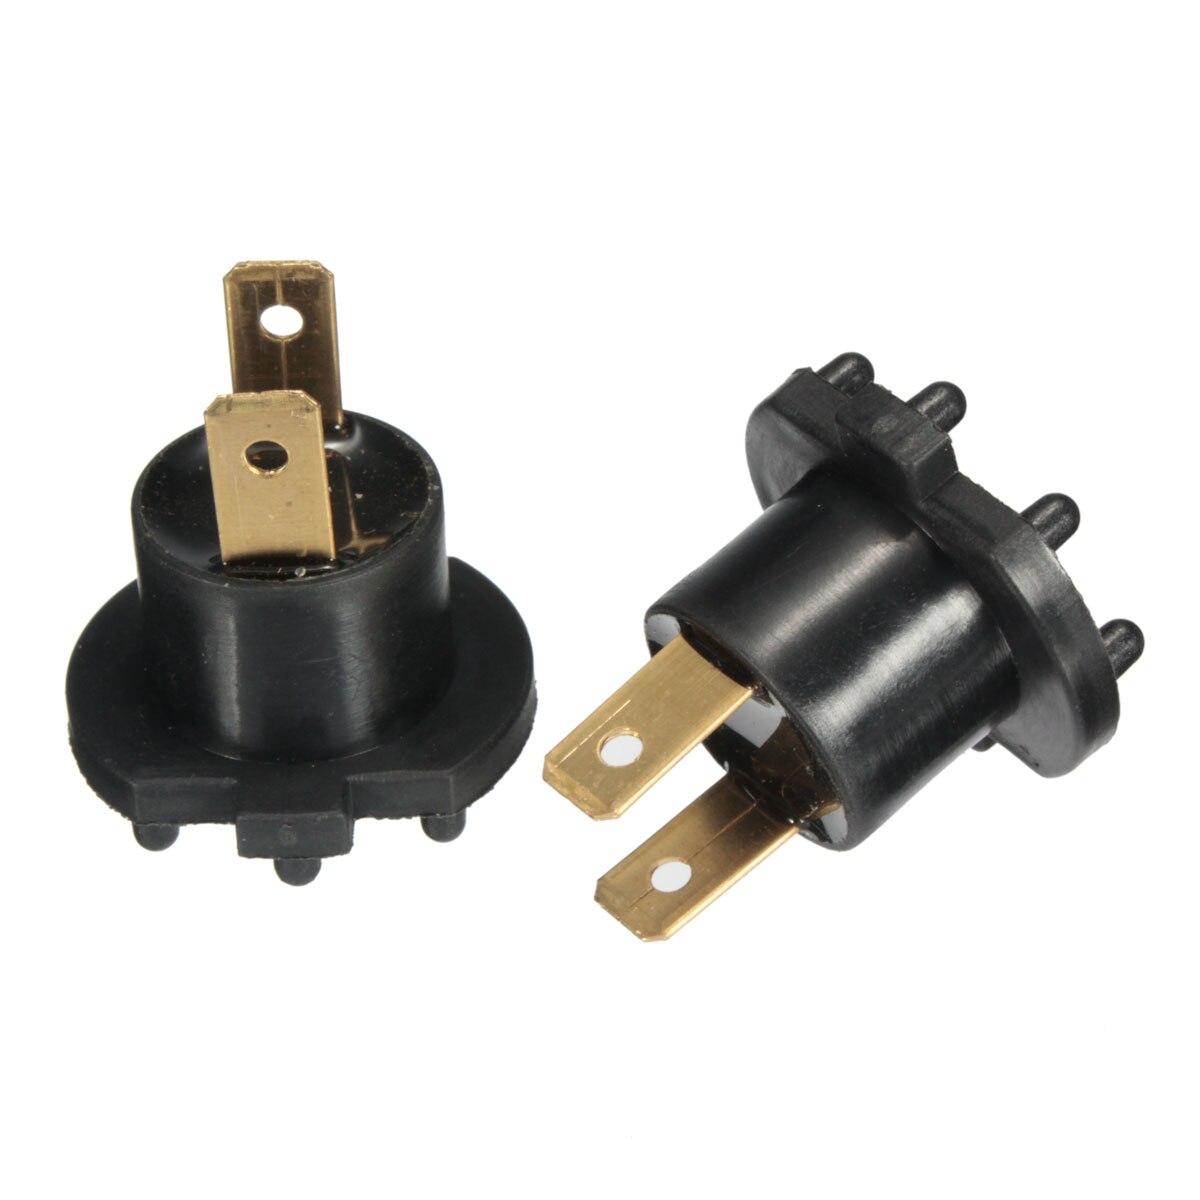 2017 2PCS Headlight Socket Plug Connector Adapter Bulb Holder Easy ... for Bulb Holder With Plug  35fsj